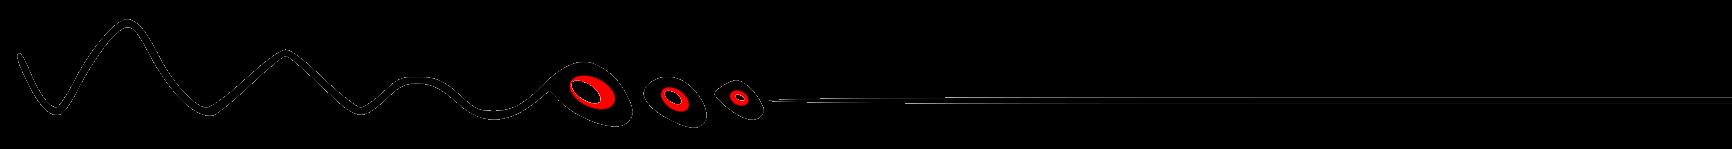 Zig-zag horizontal